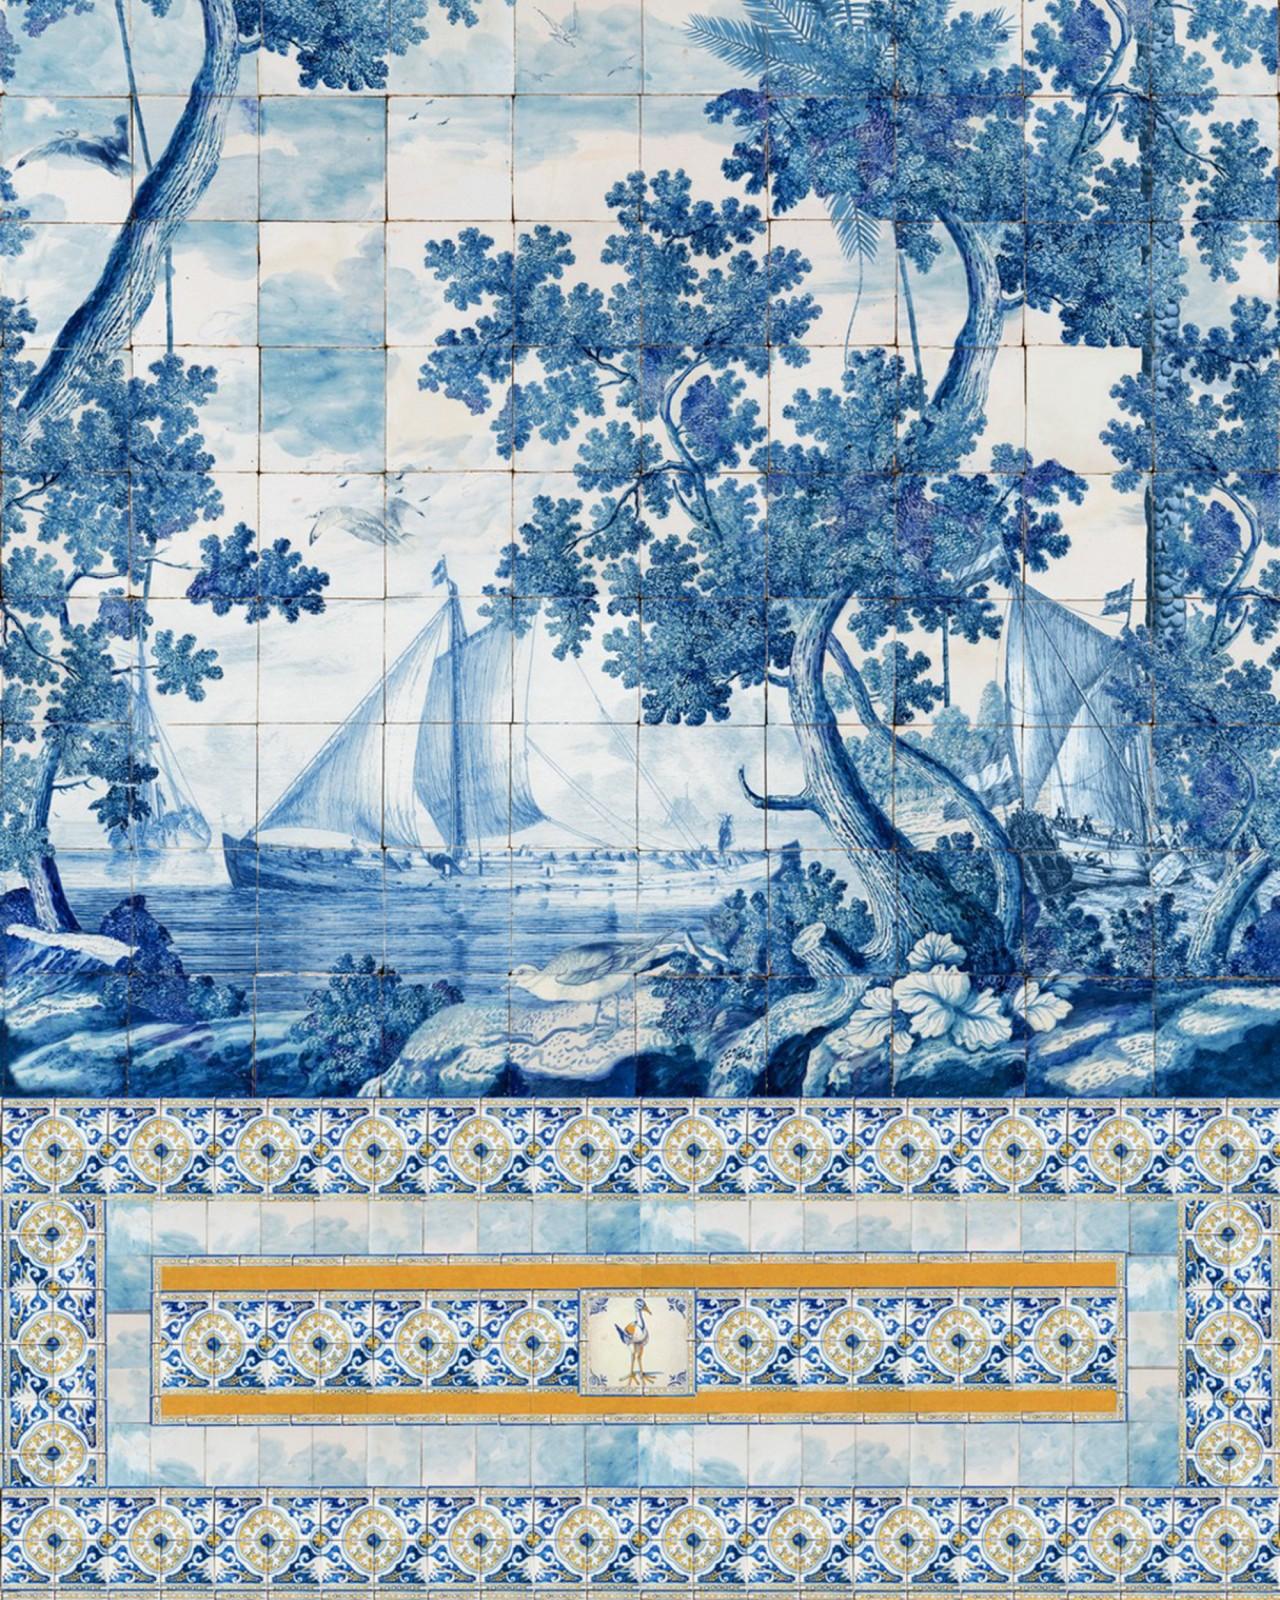 AZURE Mural Wallpaper